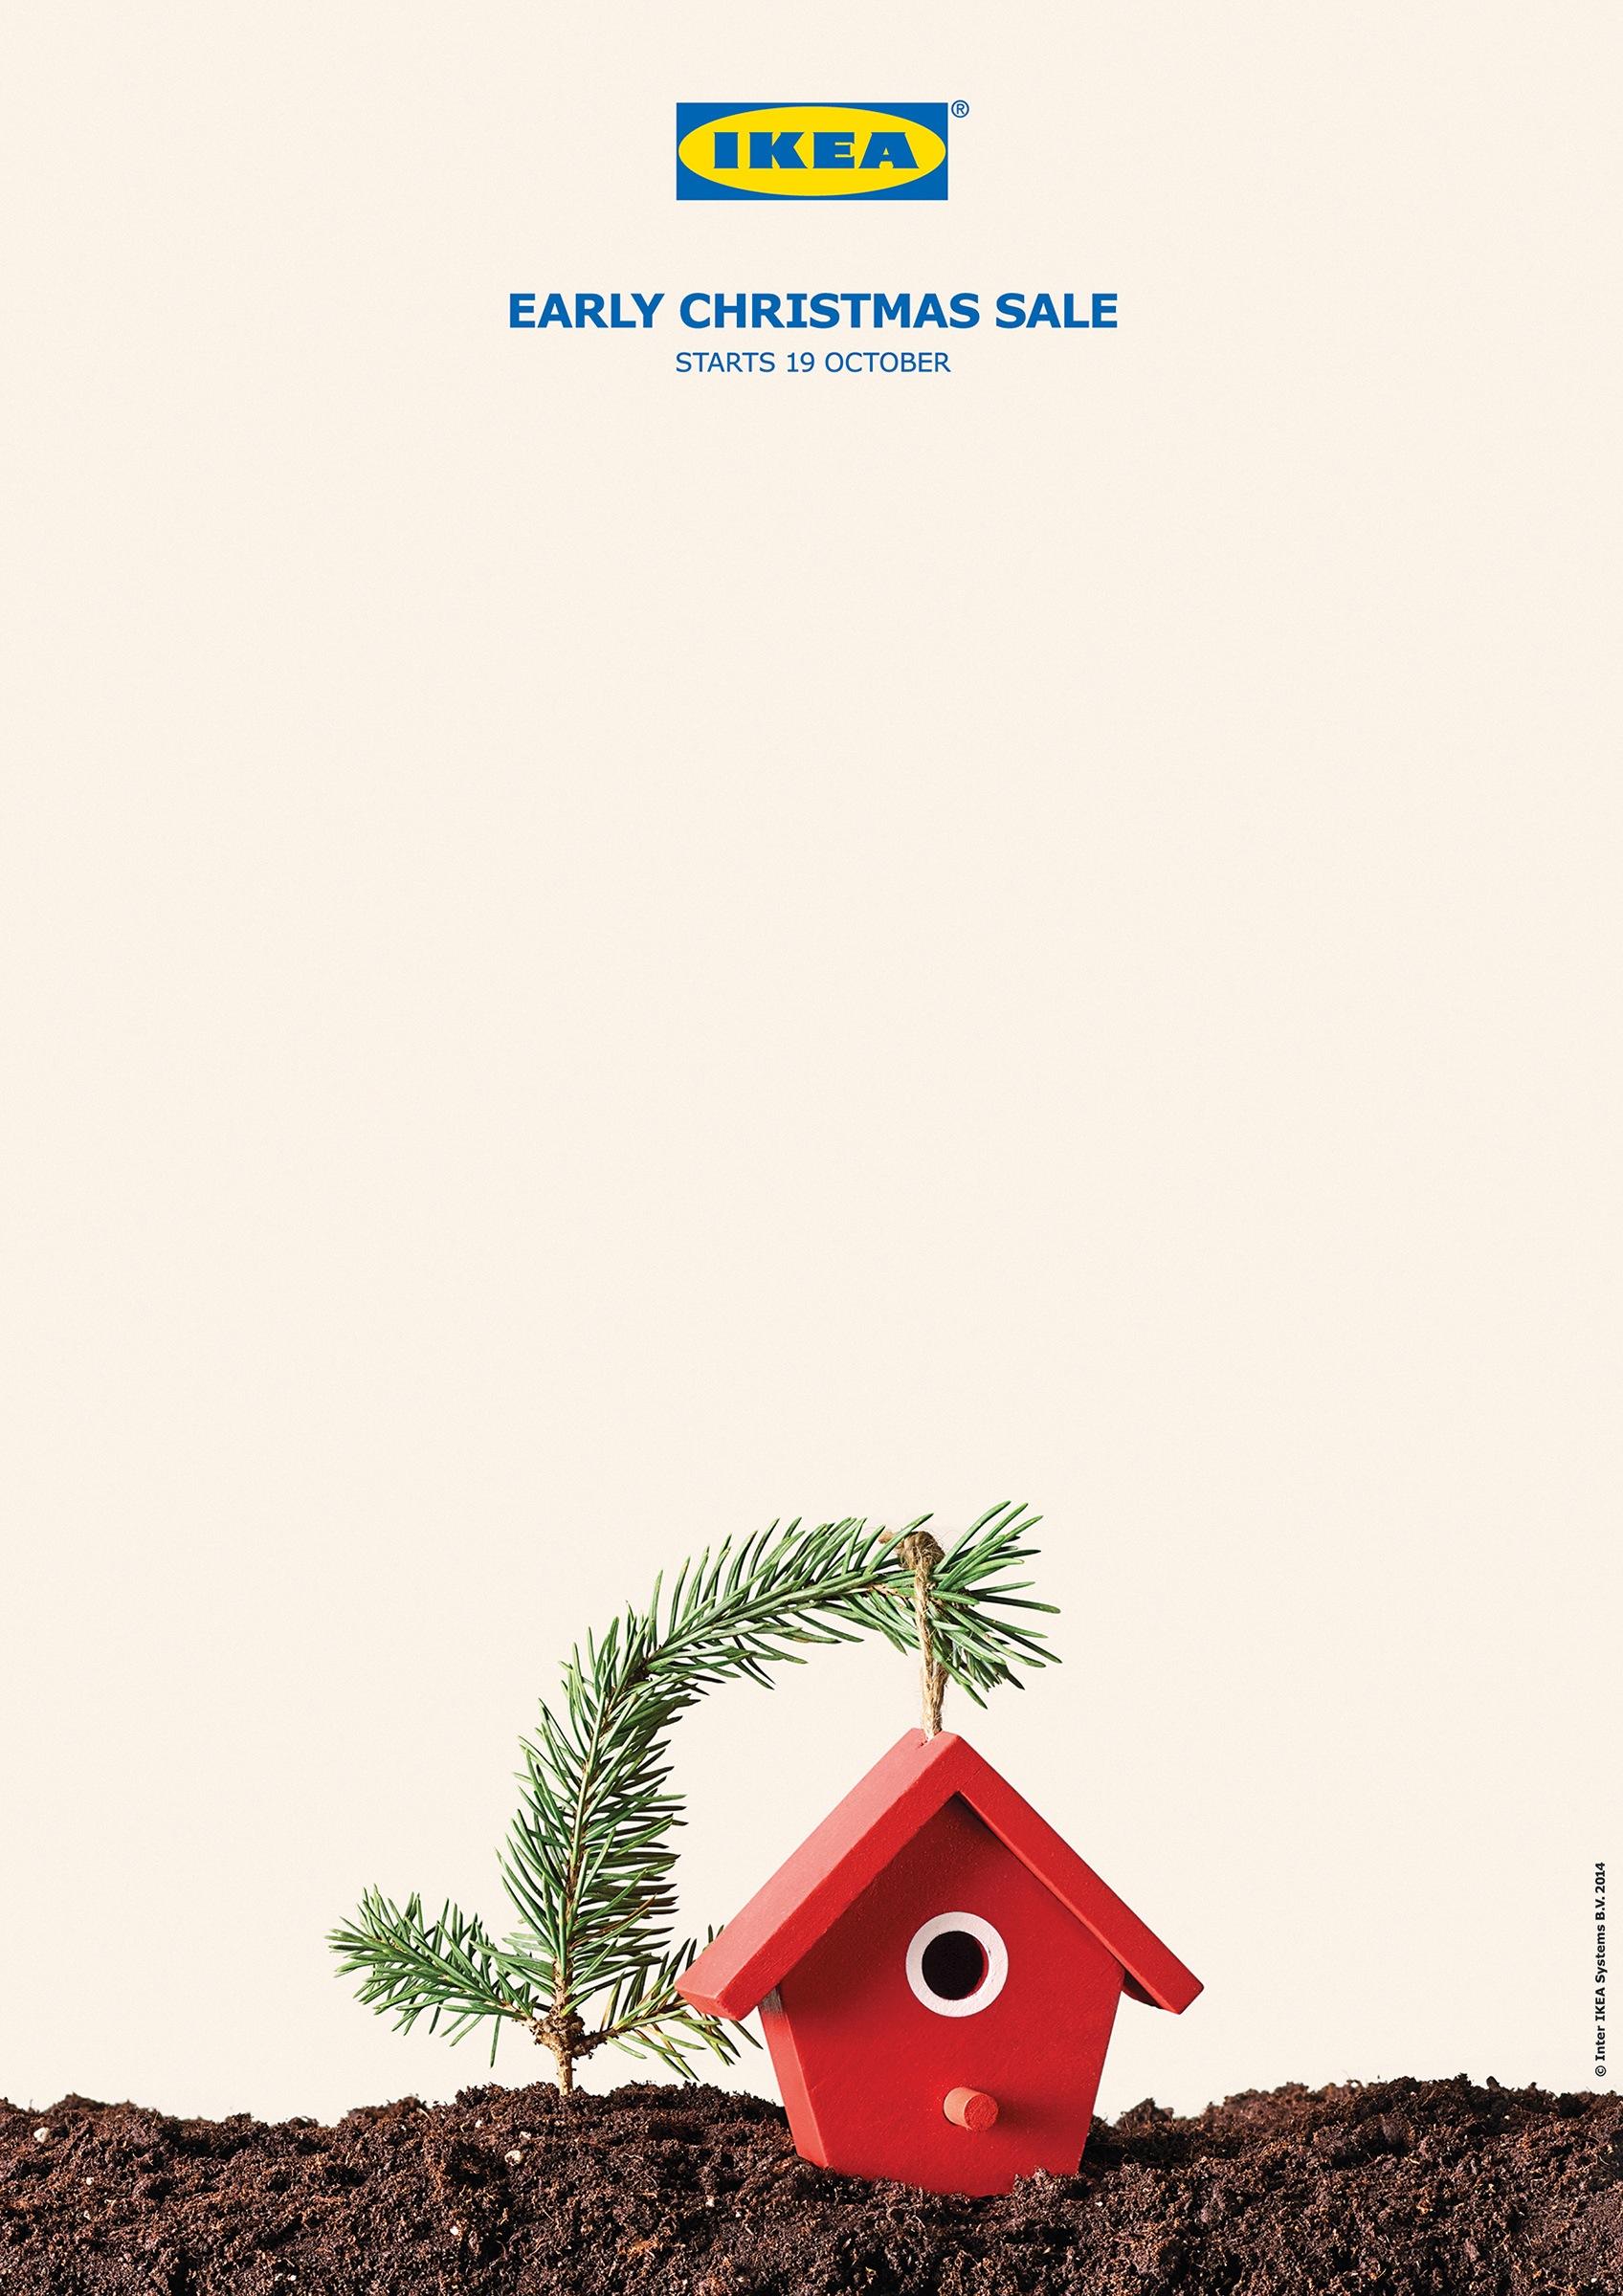 Ikea Decoration Noel Pere Noel